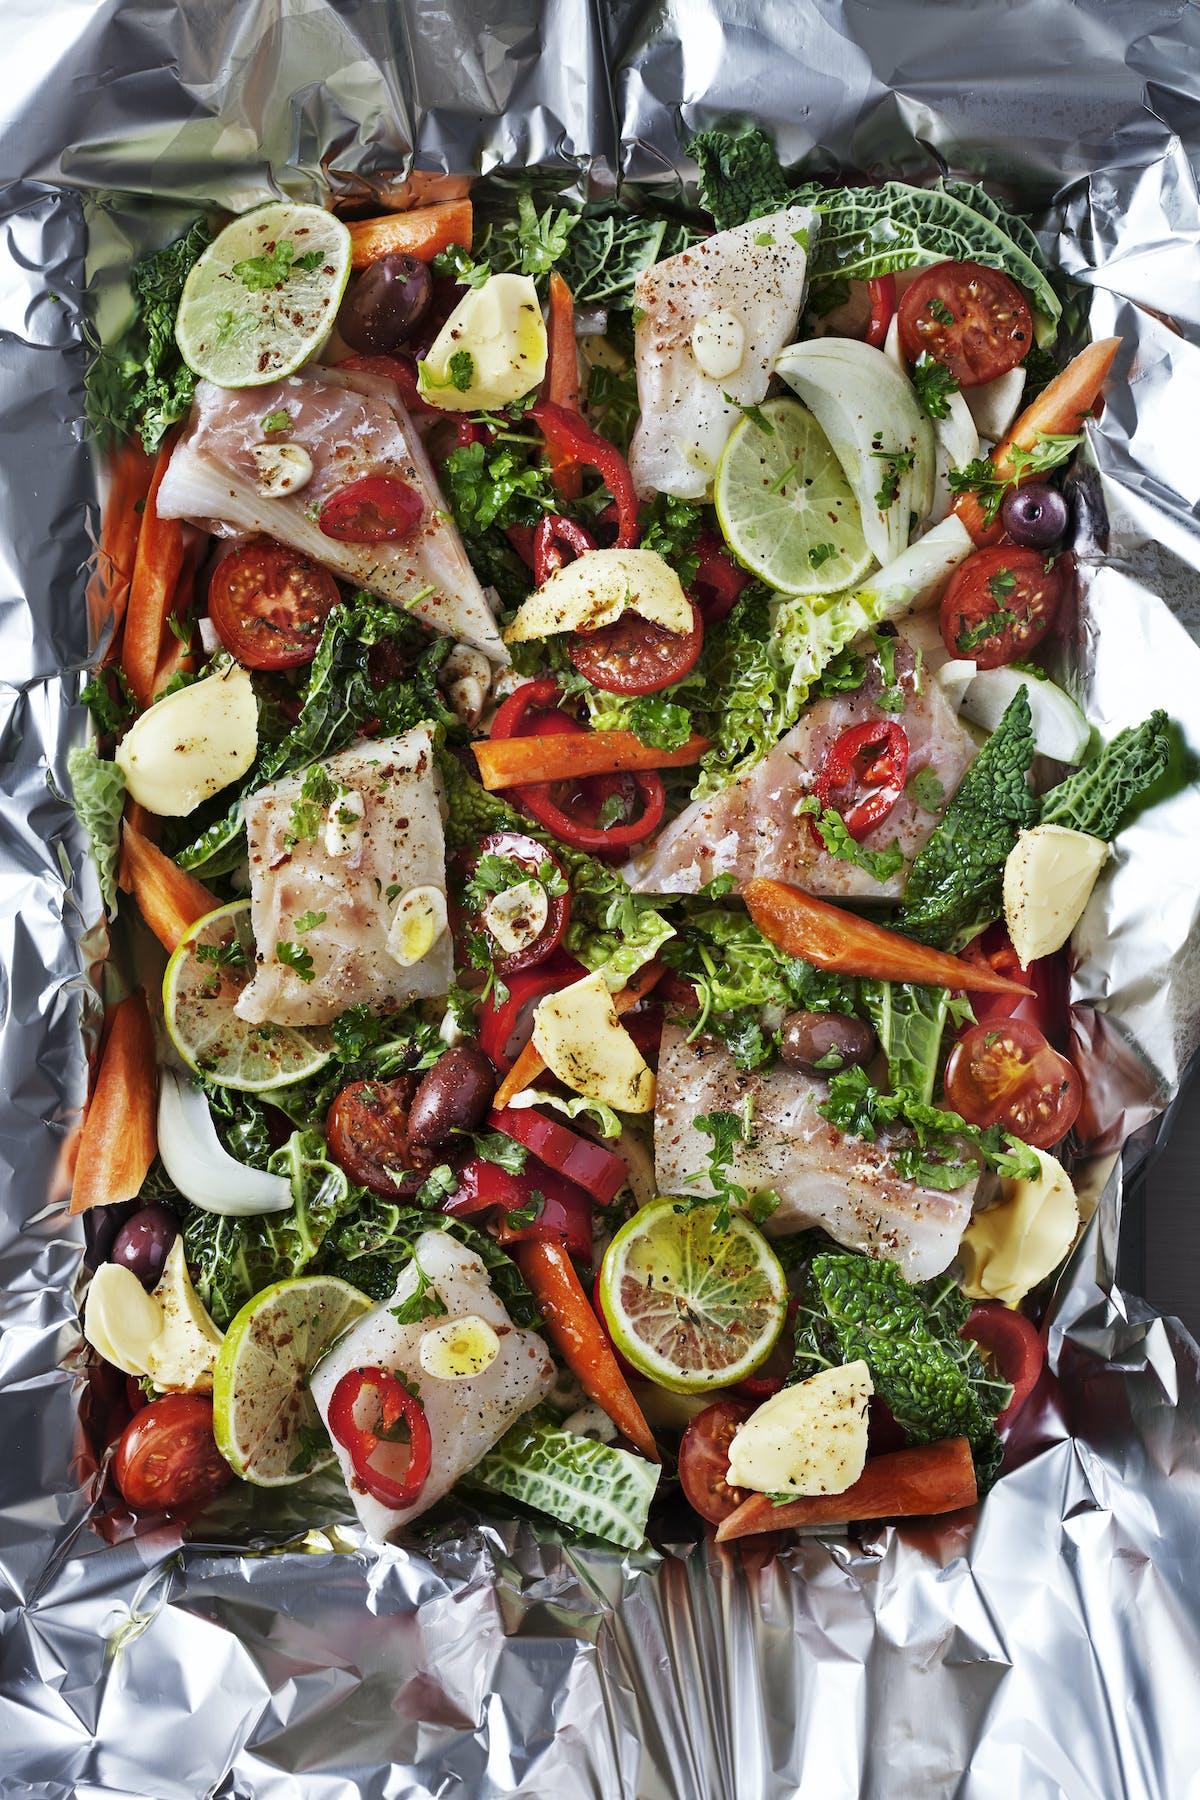 Pescado low carb con verduras horneados